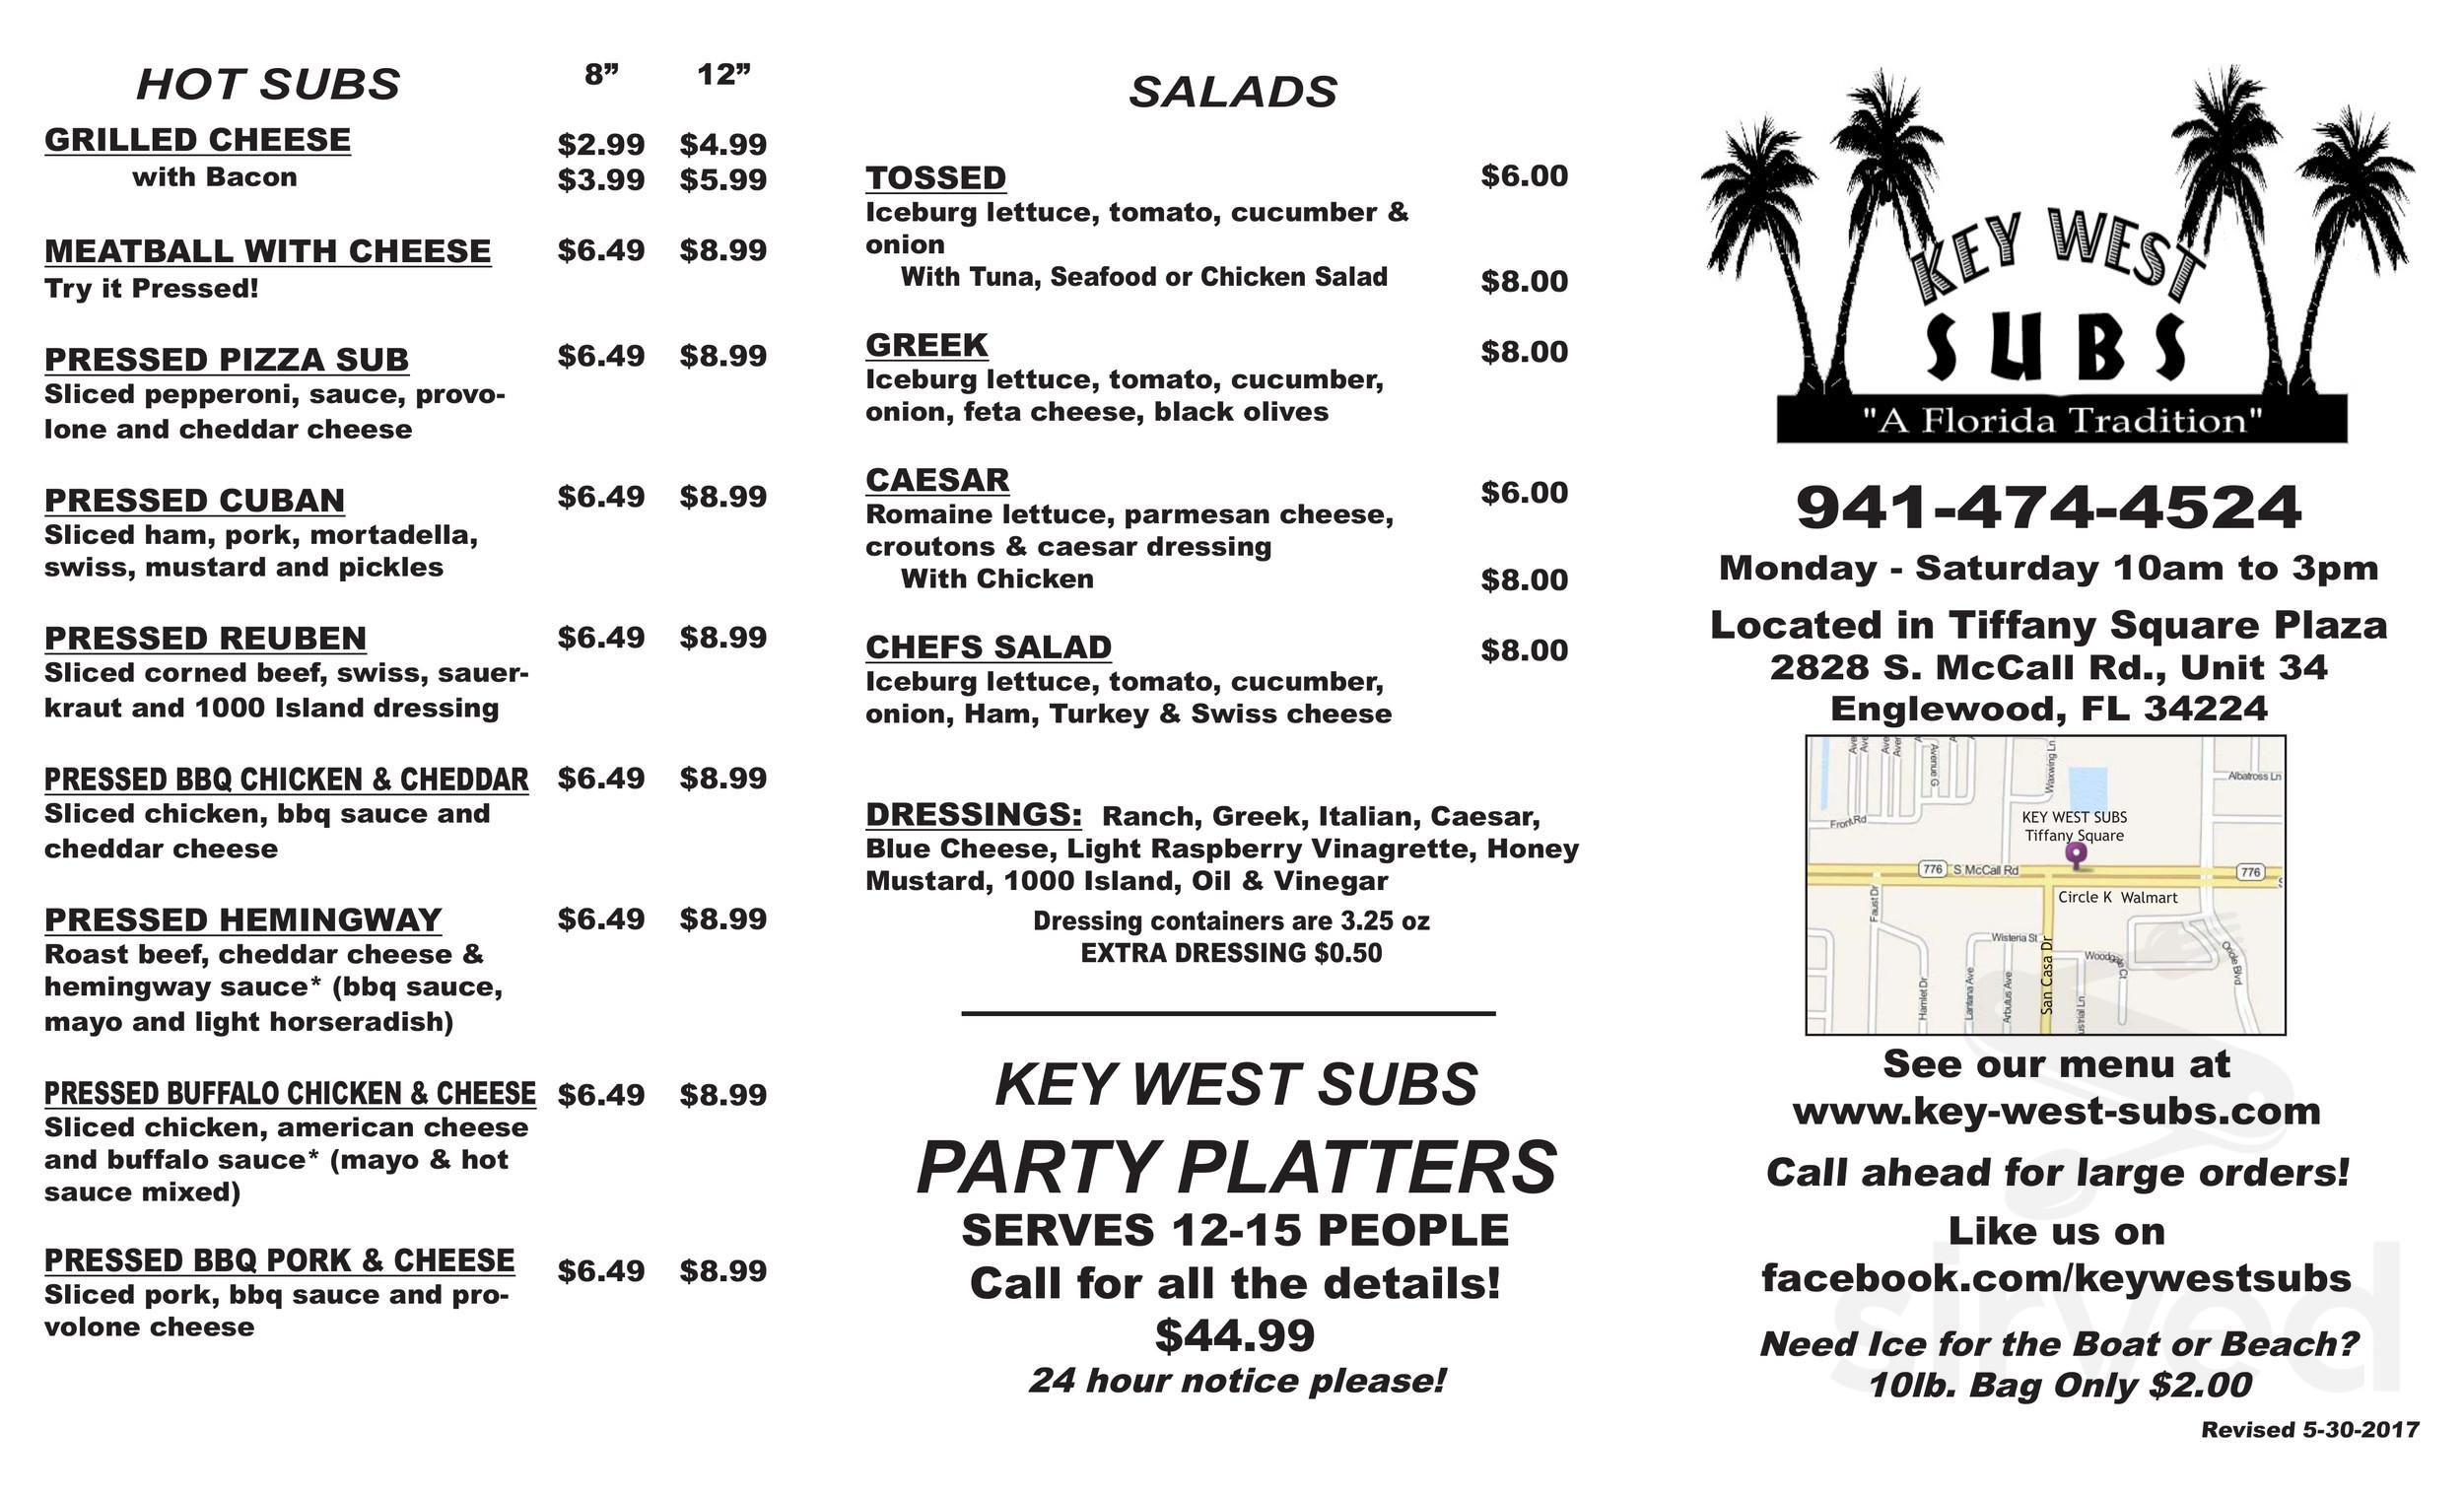 Key West Subs menu in Englewood, Florida, USA